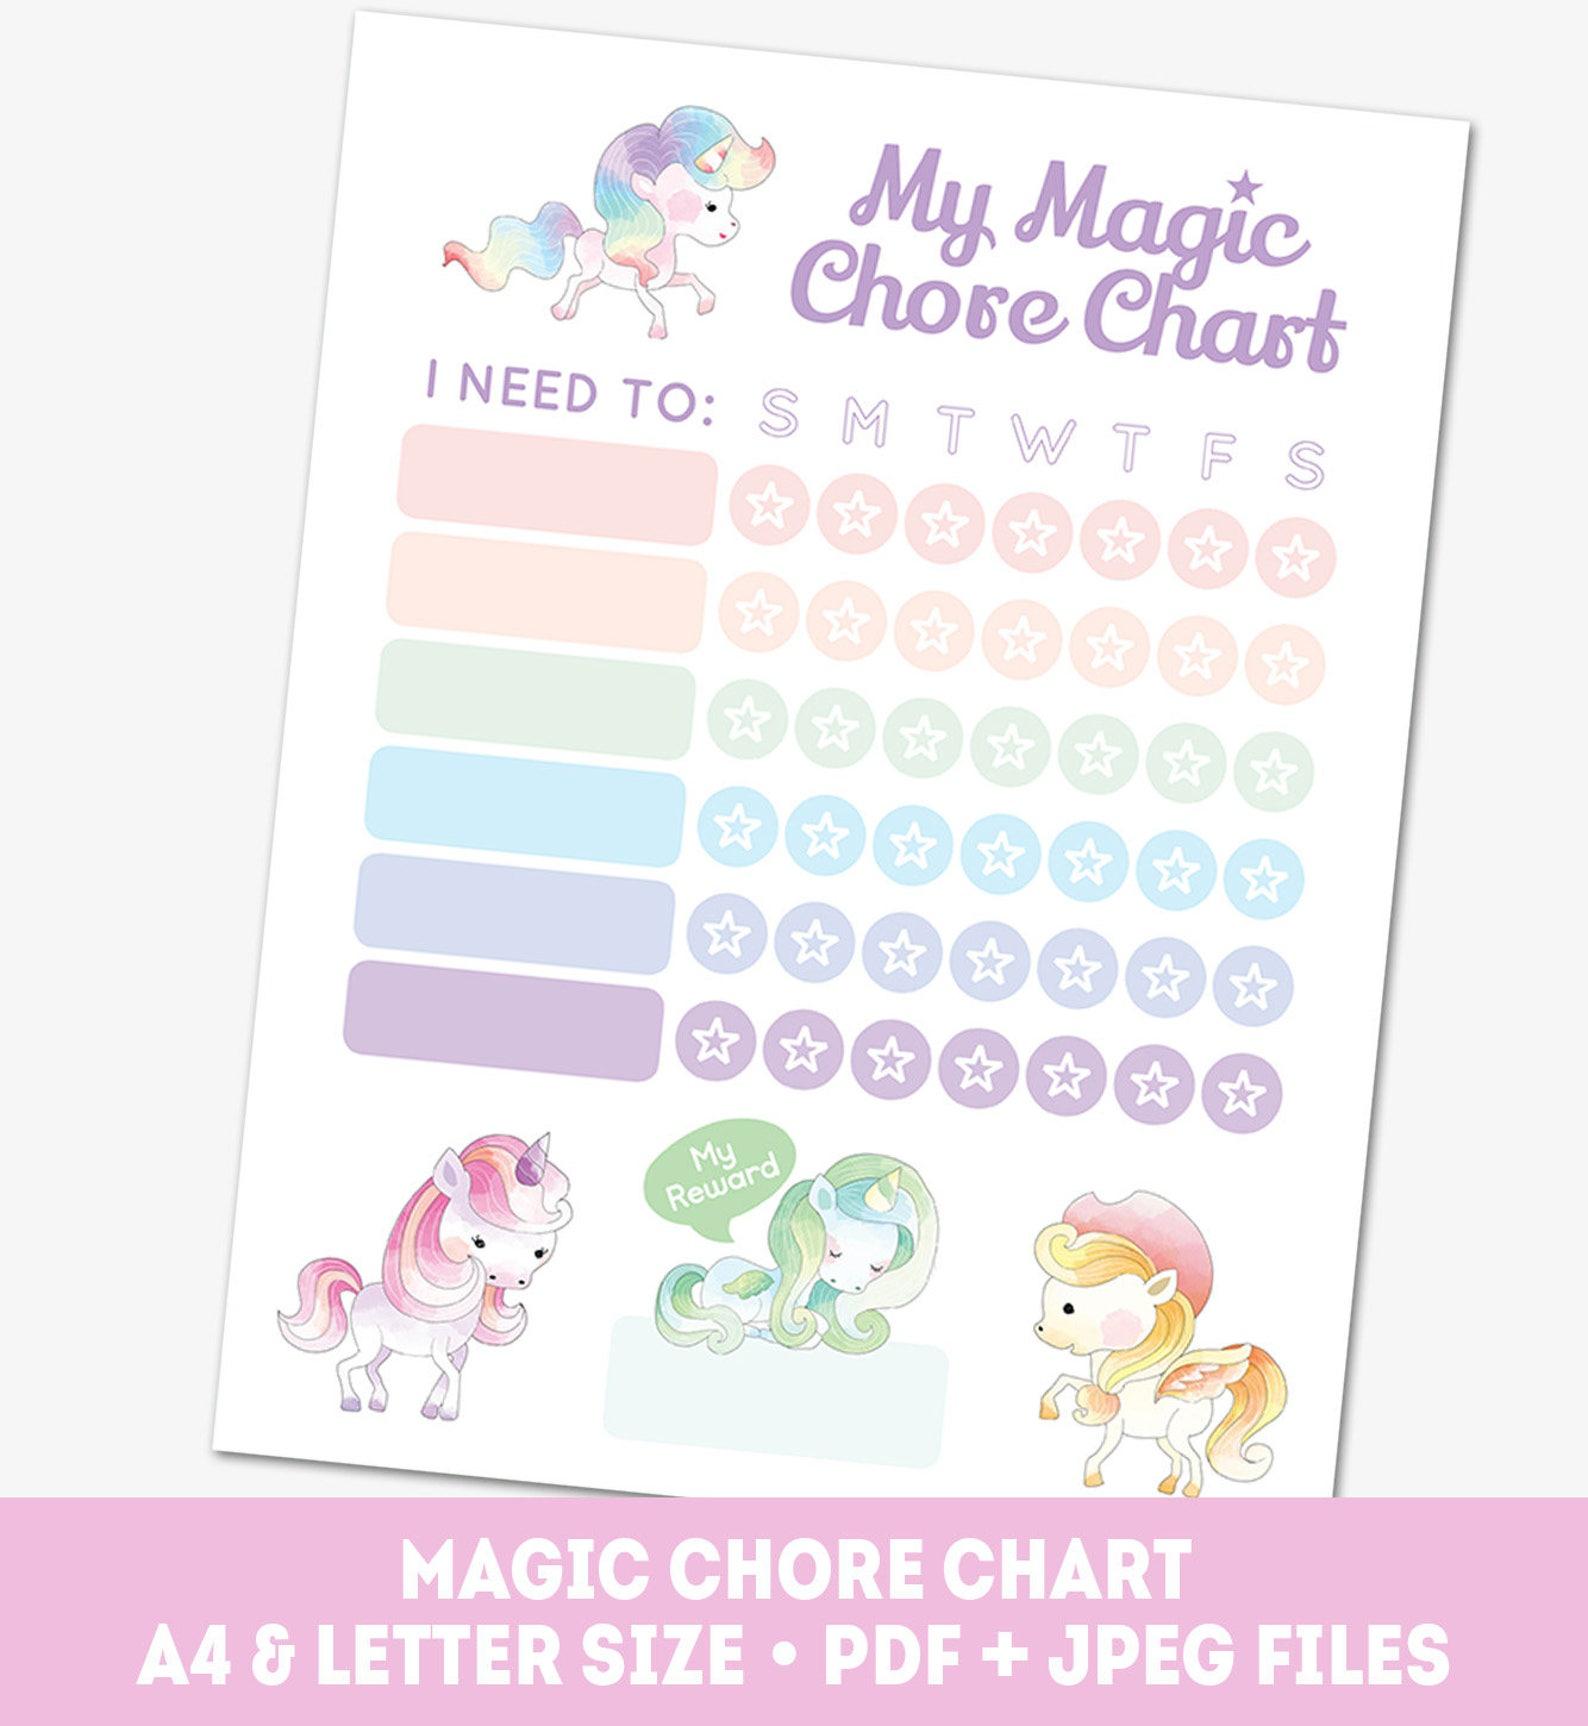 reward chart template for kids | Toddler reward chart